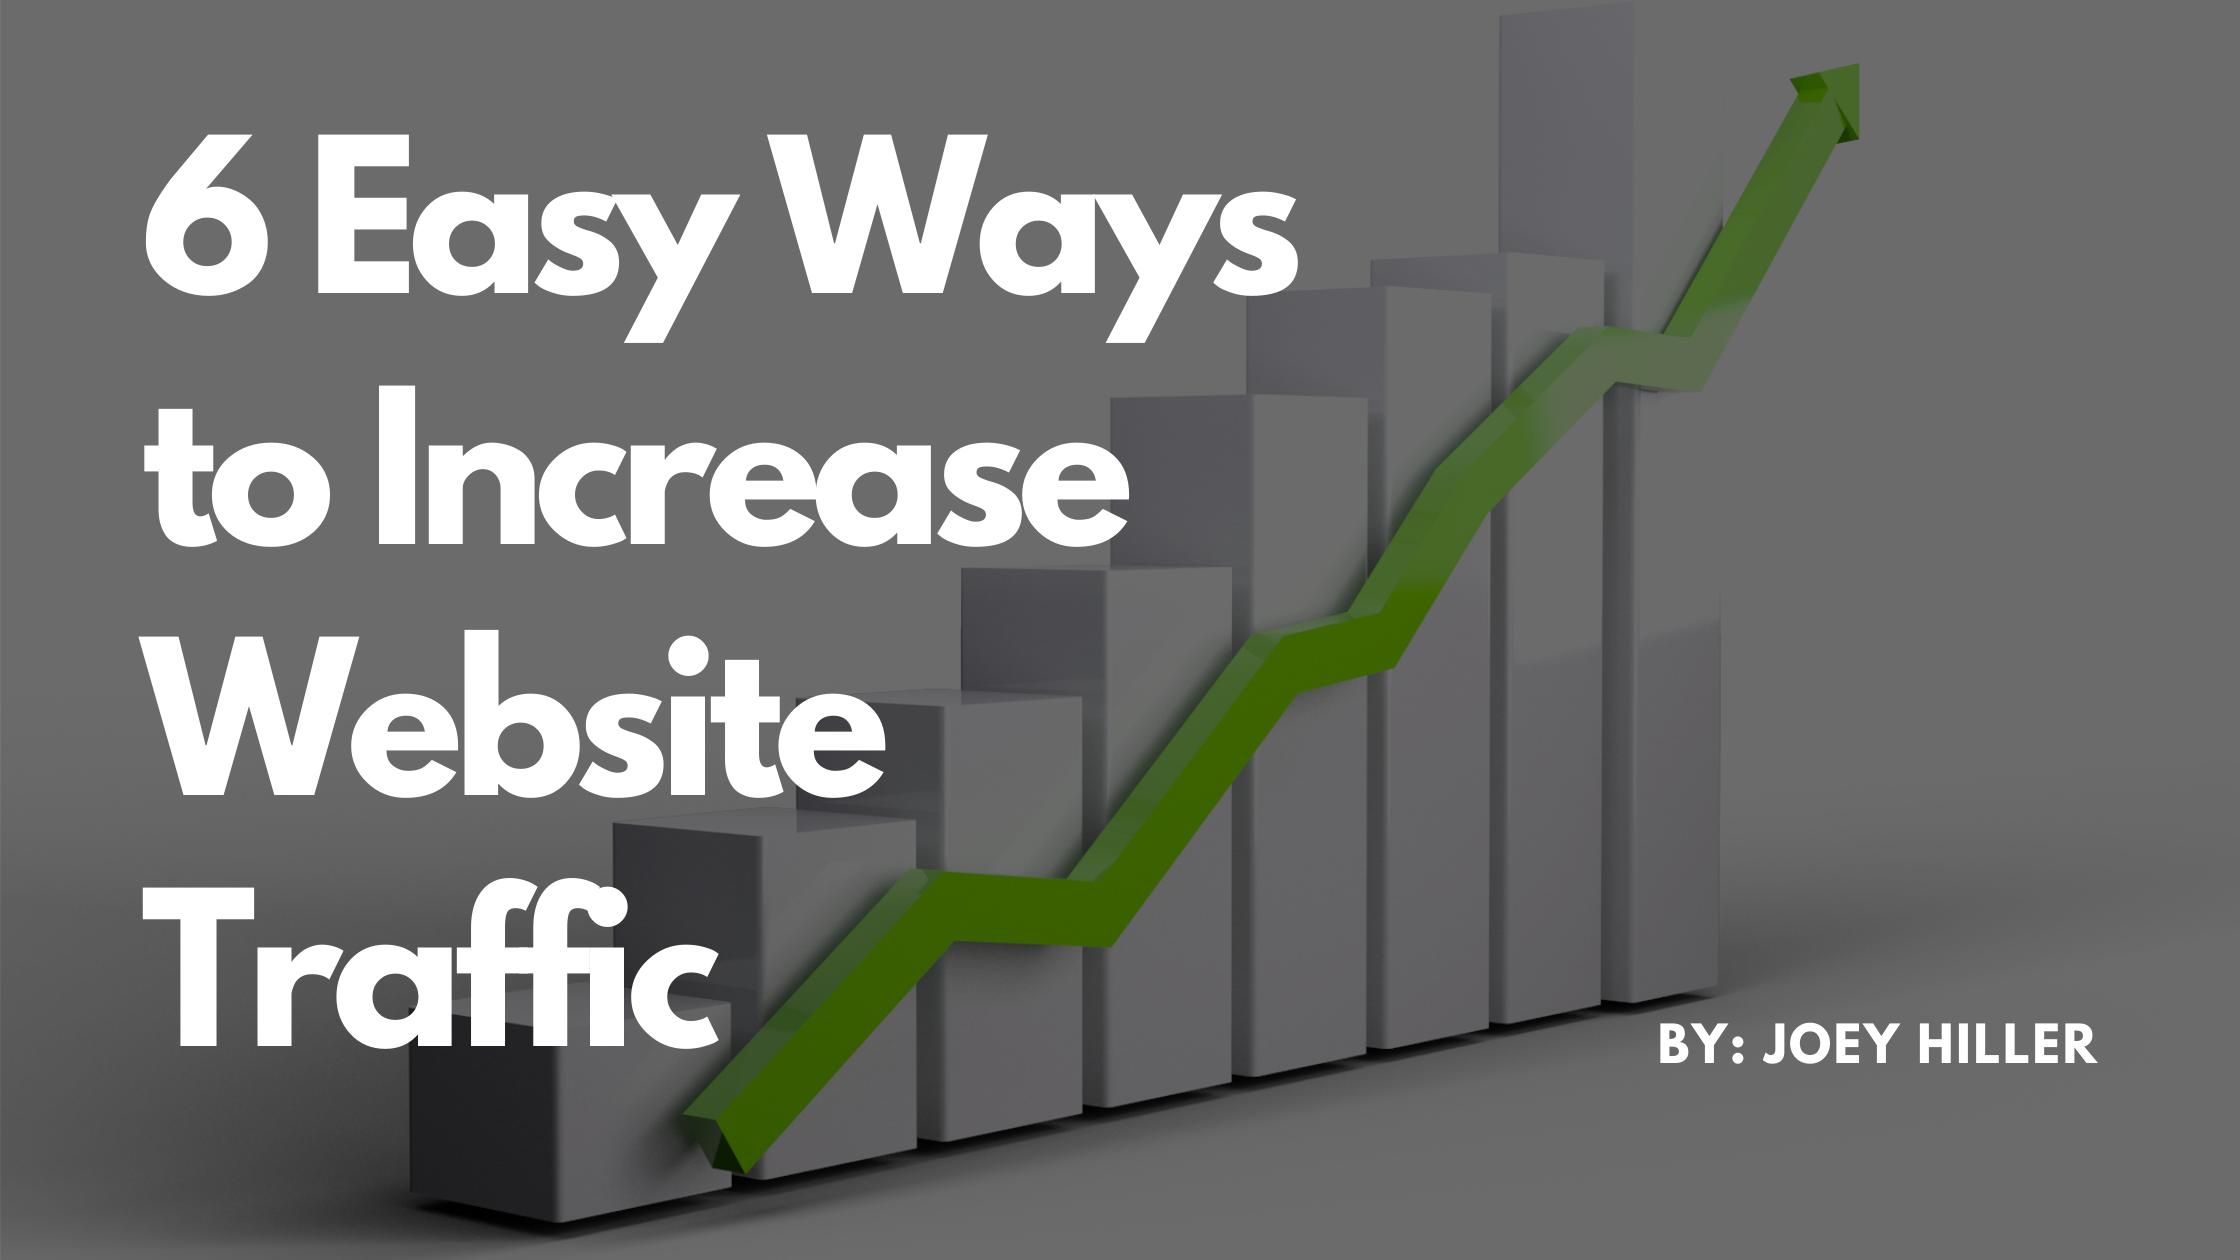 6 Easy Ways to Increase Website Traffic